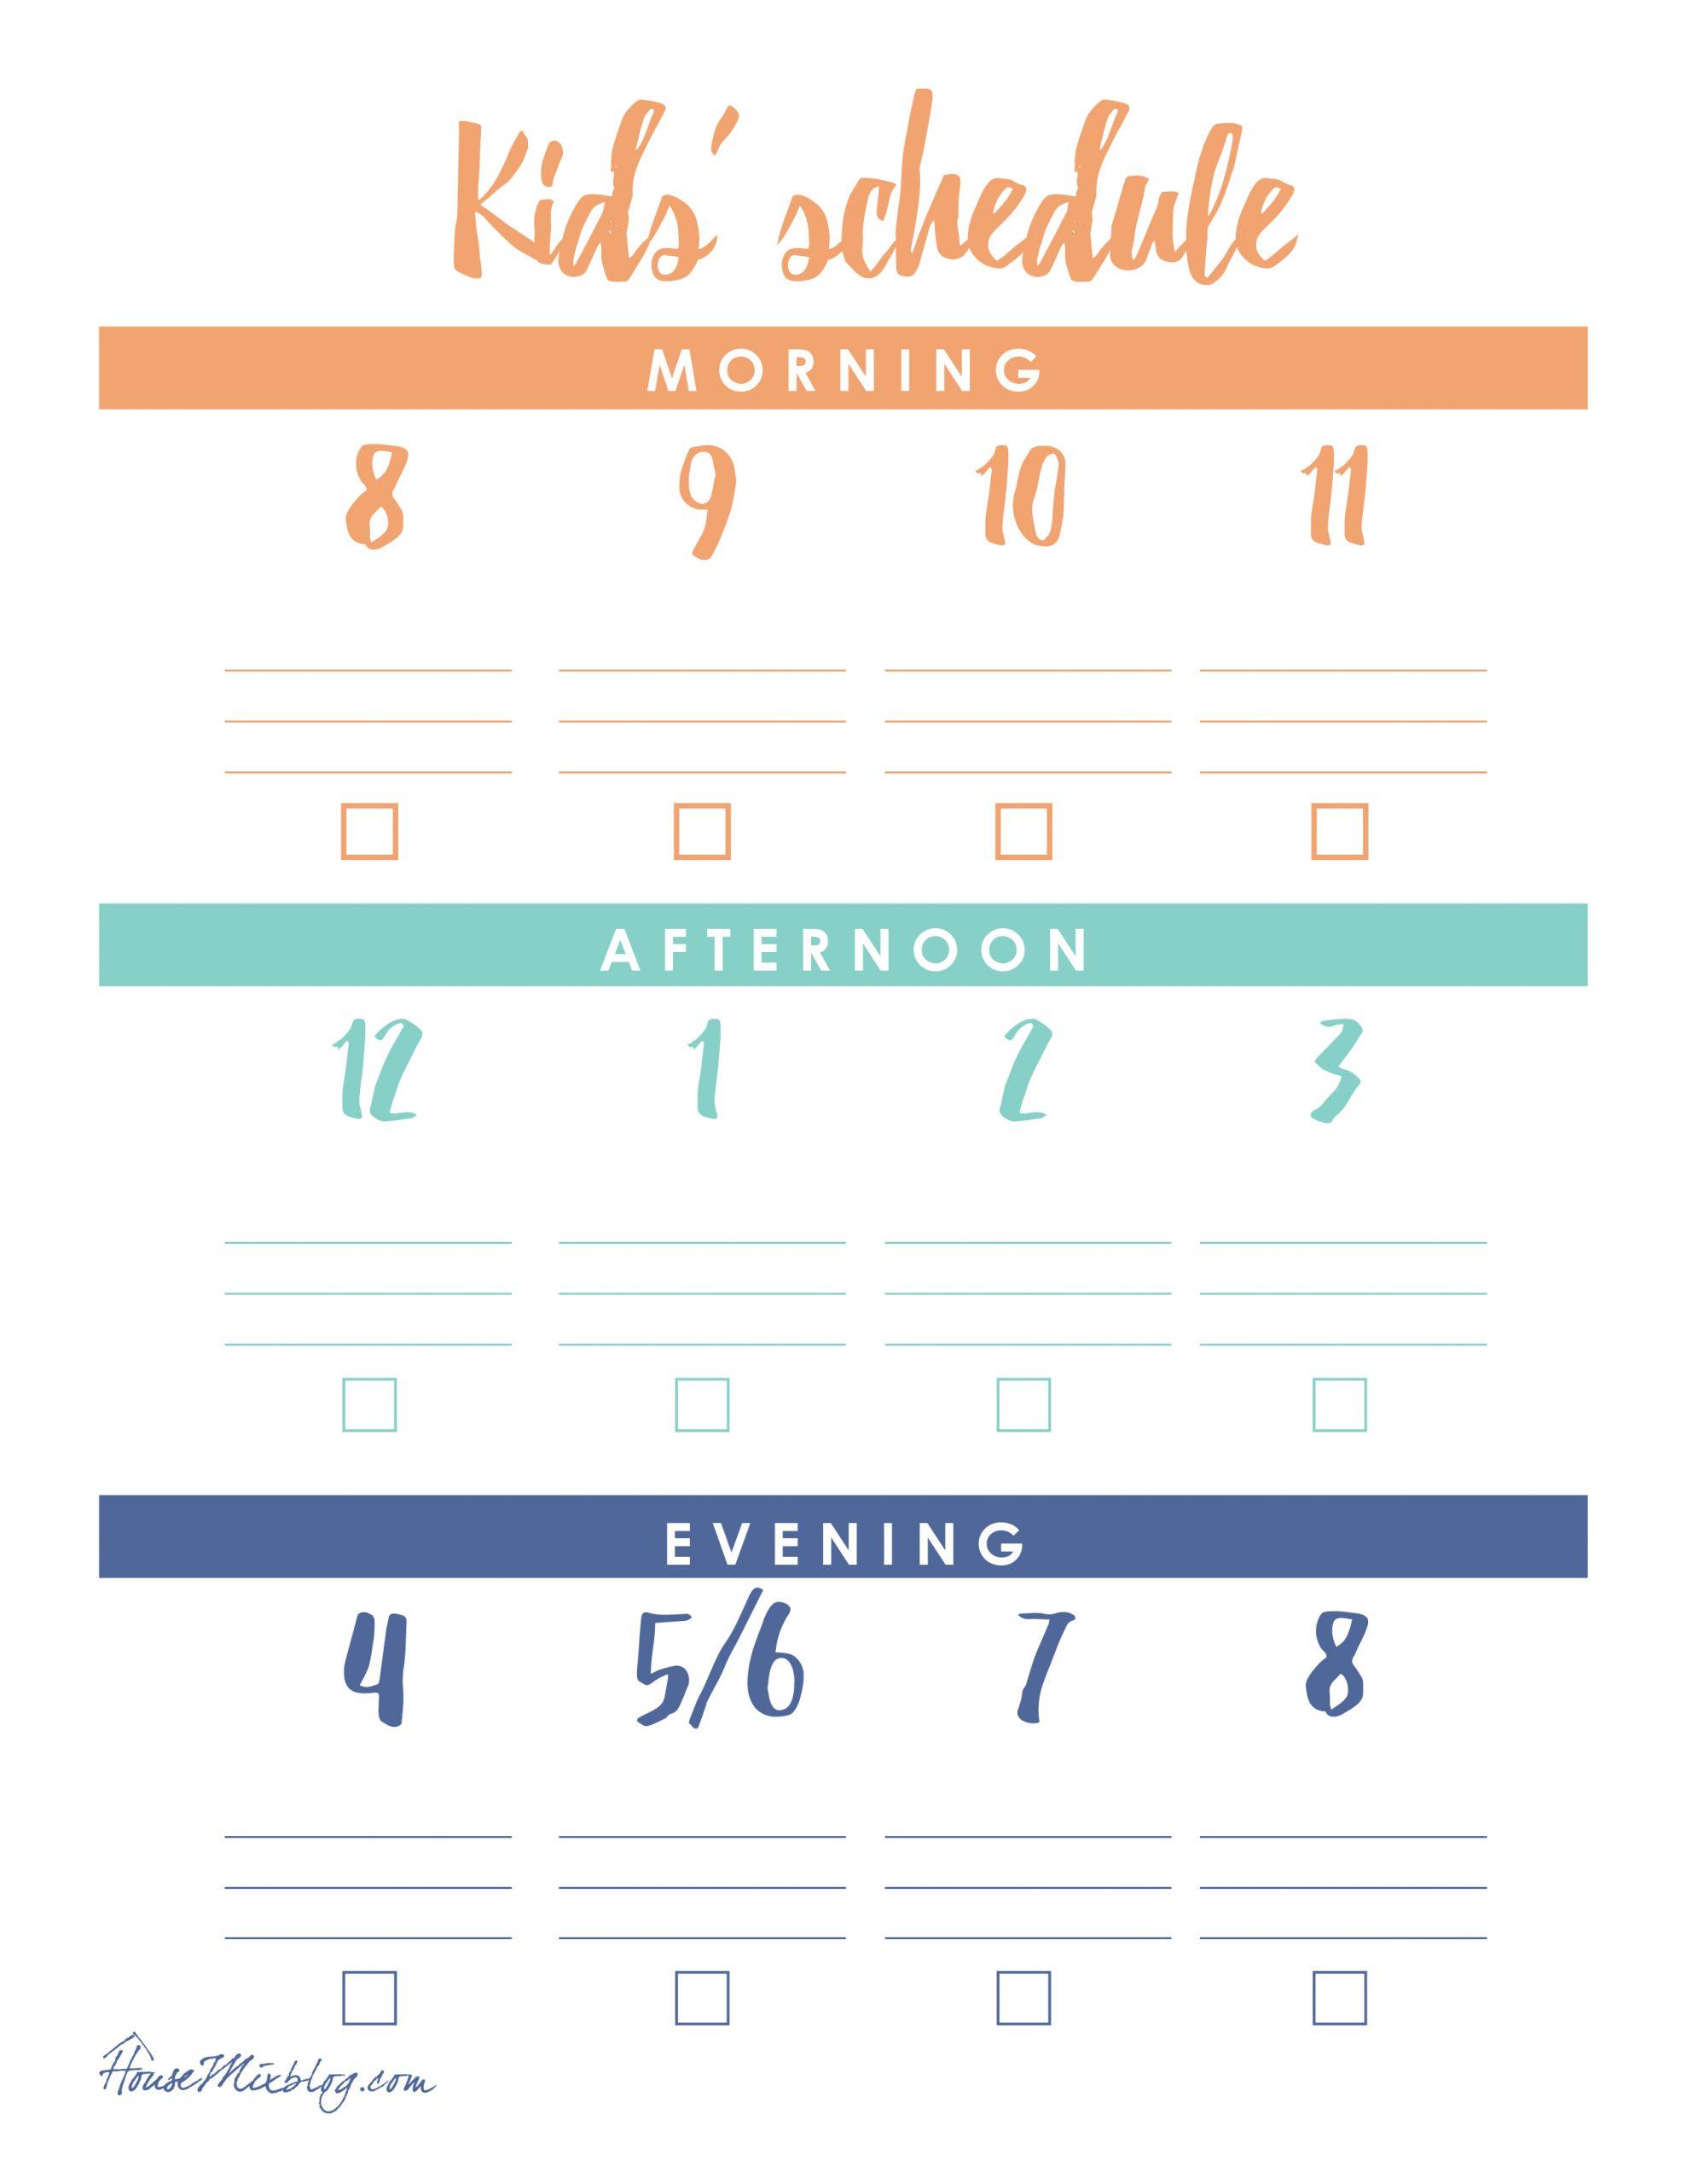 At Home Kid Schedule Printable